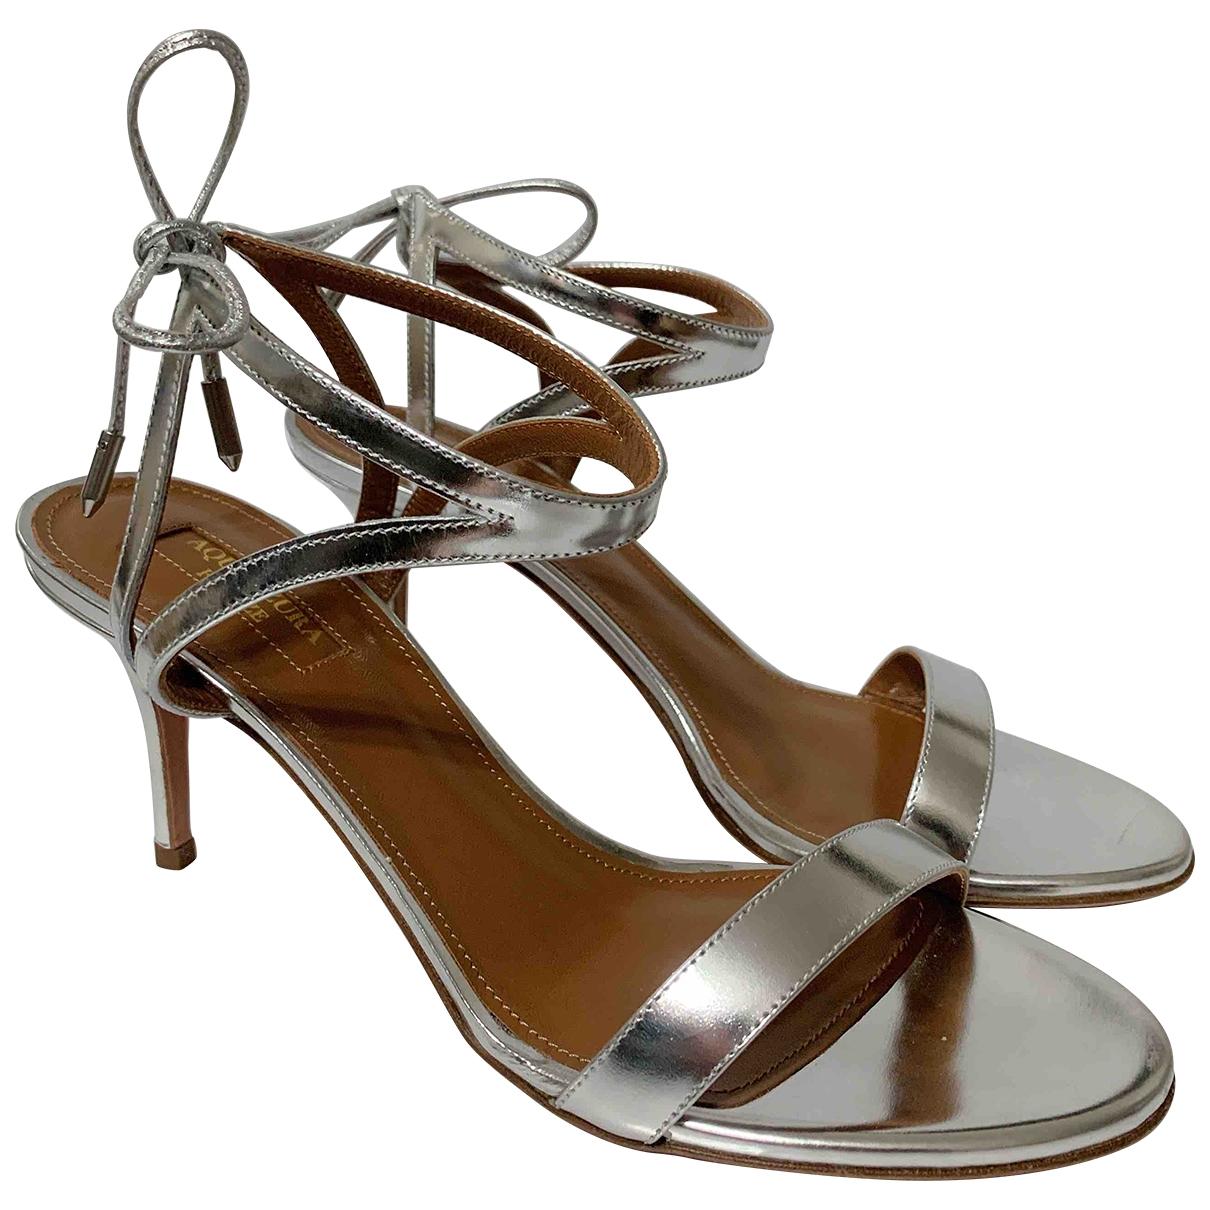 Aquazzura \N Silver Leather Sandals for Women 38 EU